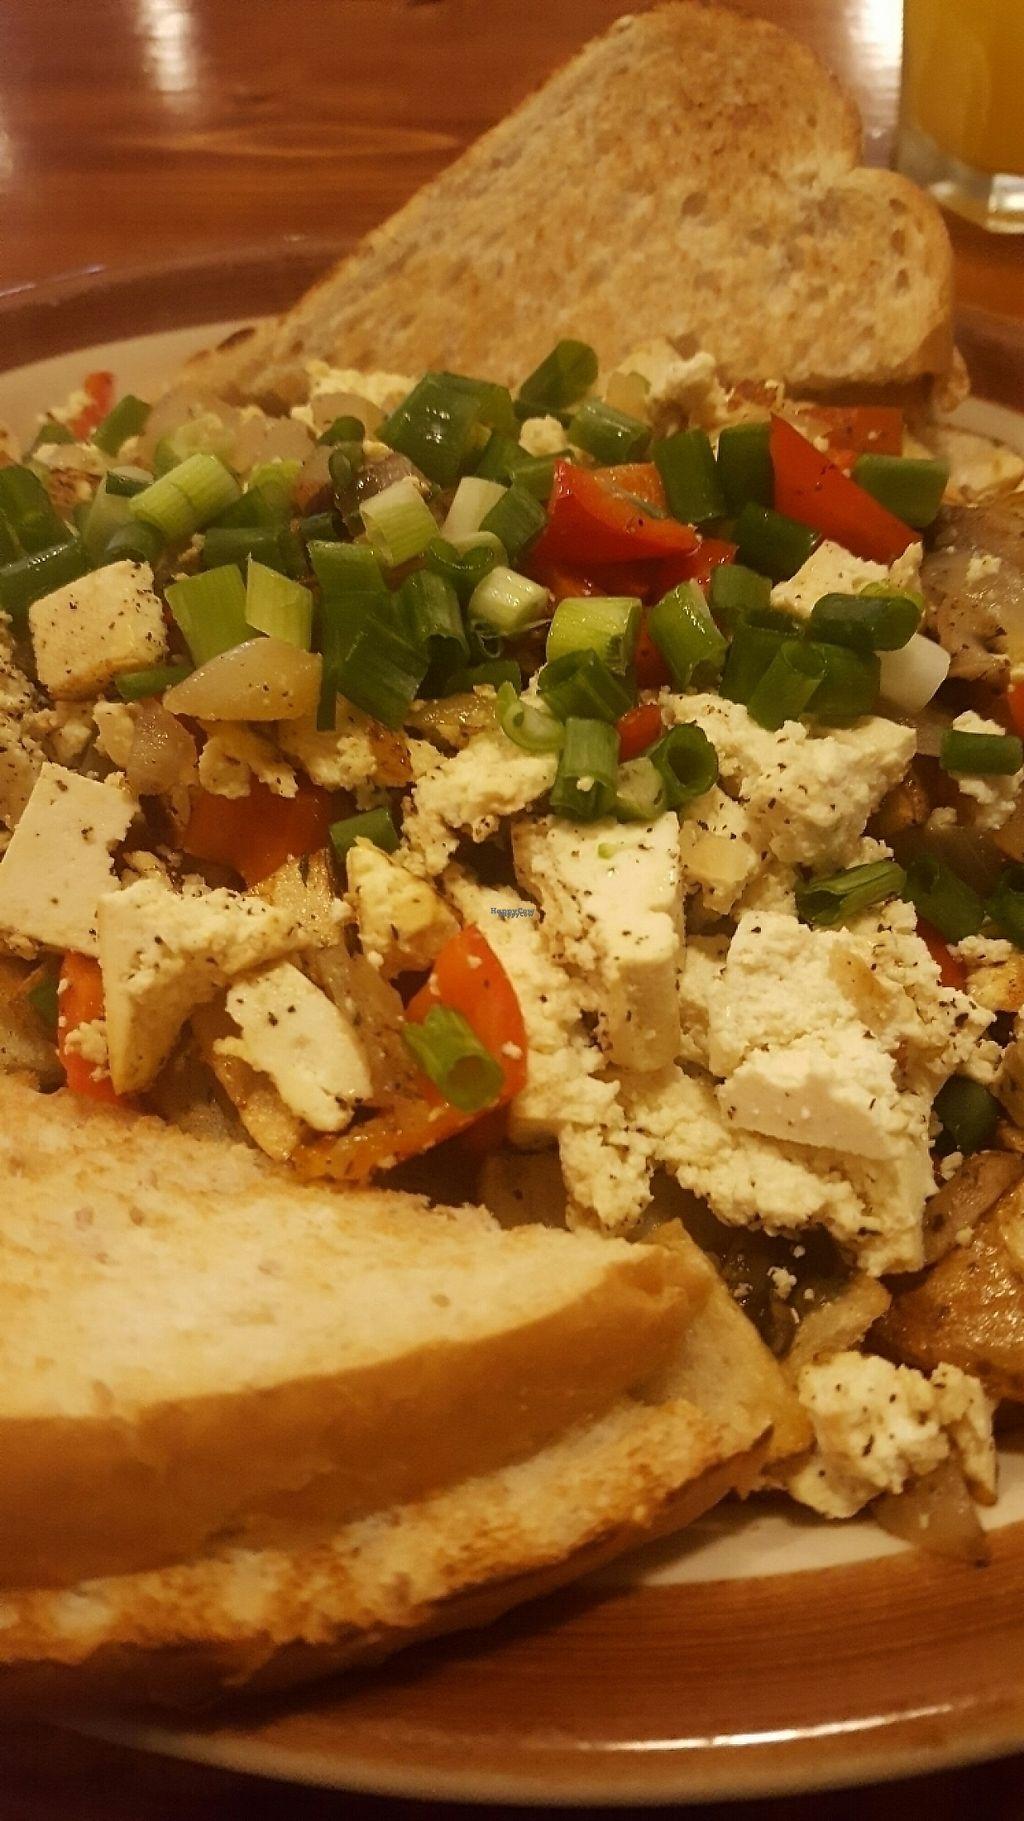 "Photo of Hunter Gatherer Vegetarian Diner  by <a href=""/members/profile/VeganKateMA"">VeganKateMA</a> <br/>tofu scramble (vegan)  <br/> April 30, 2017  - <a href='/contact/abuse/image/80201/254196'>Report</a>"